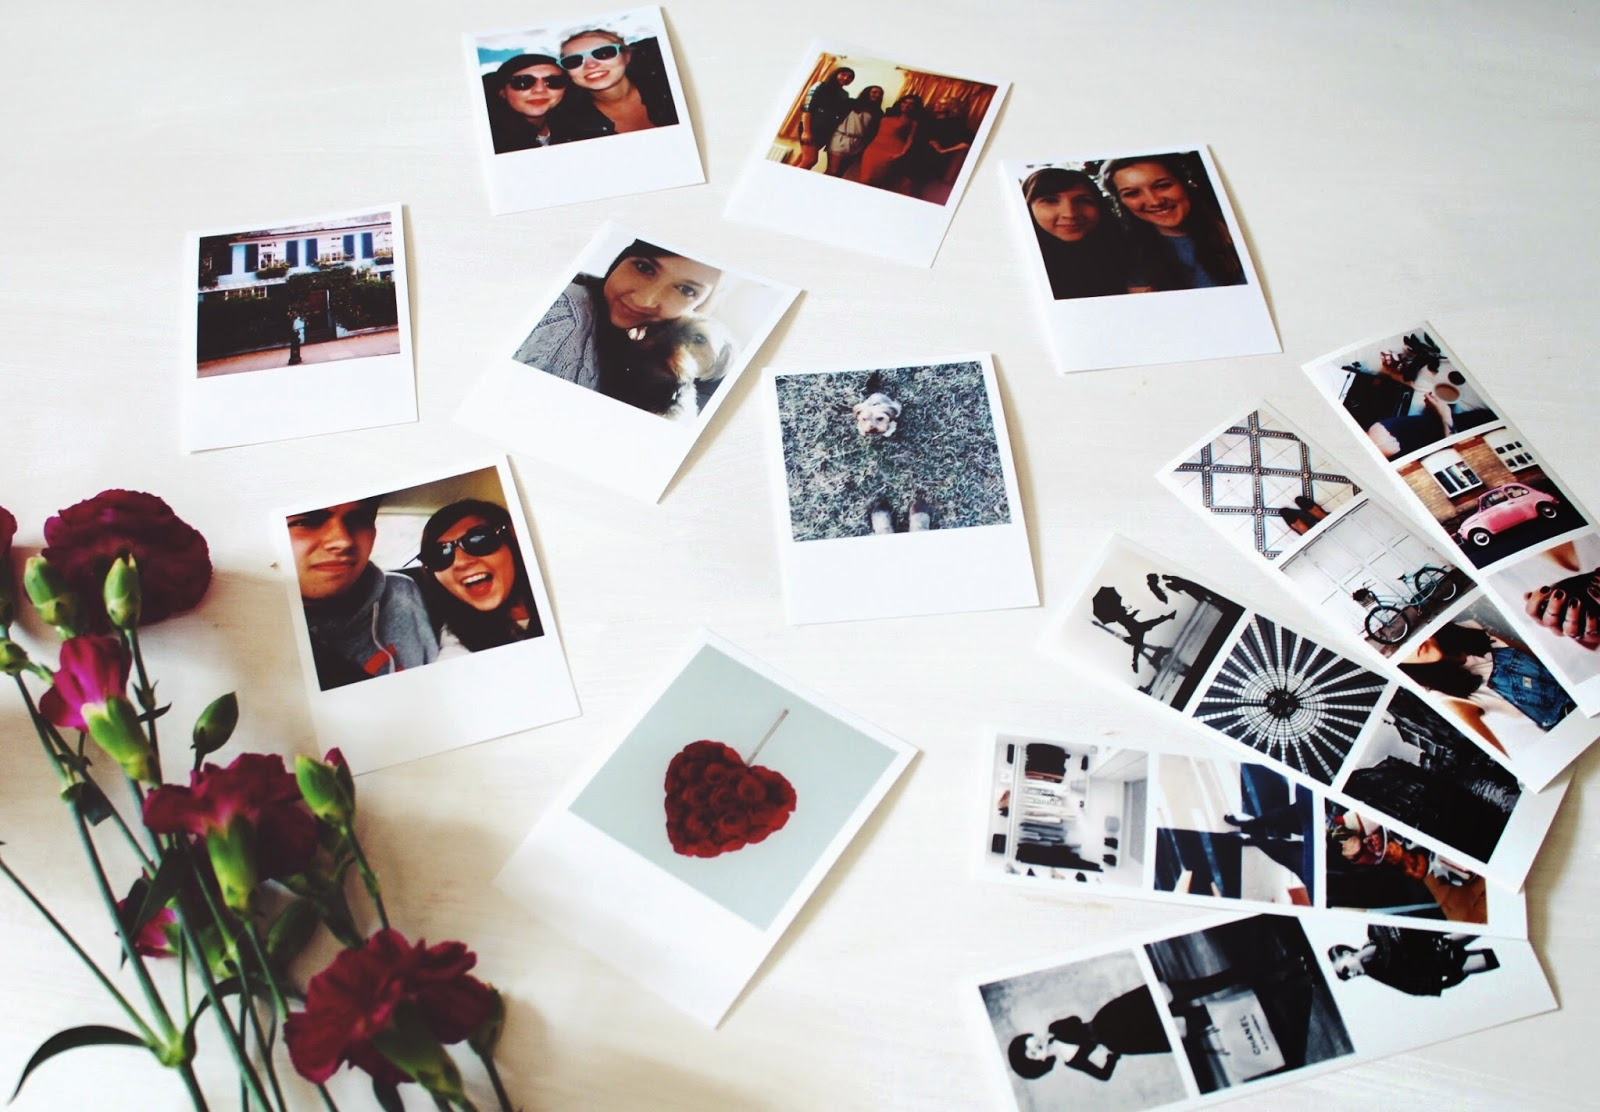 fbloggers, fblogger, polaroid, photography, polabora, polaborareview, polaroidphotos, topshop, retrostrips, halcyonvelvet, roughtrade, instagram, facebook, photos, polaboradiscountcode, lbloggers, lifestylebloggers, fashionbloggers